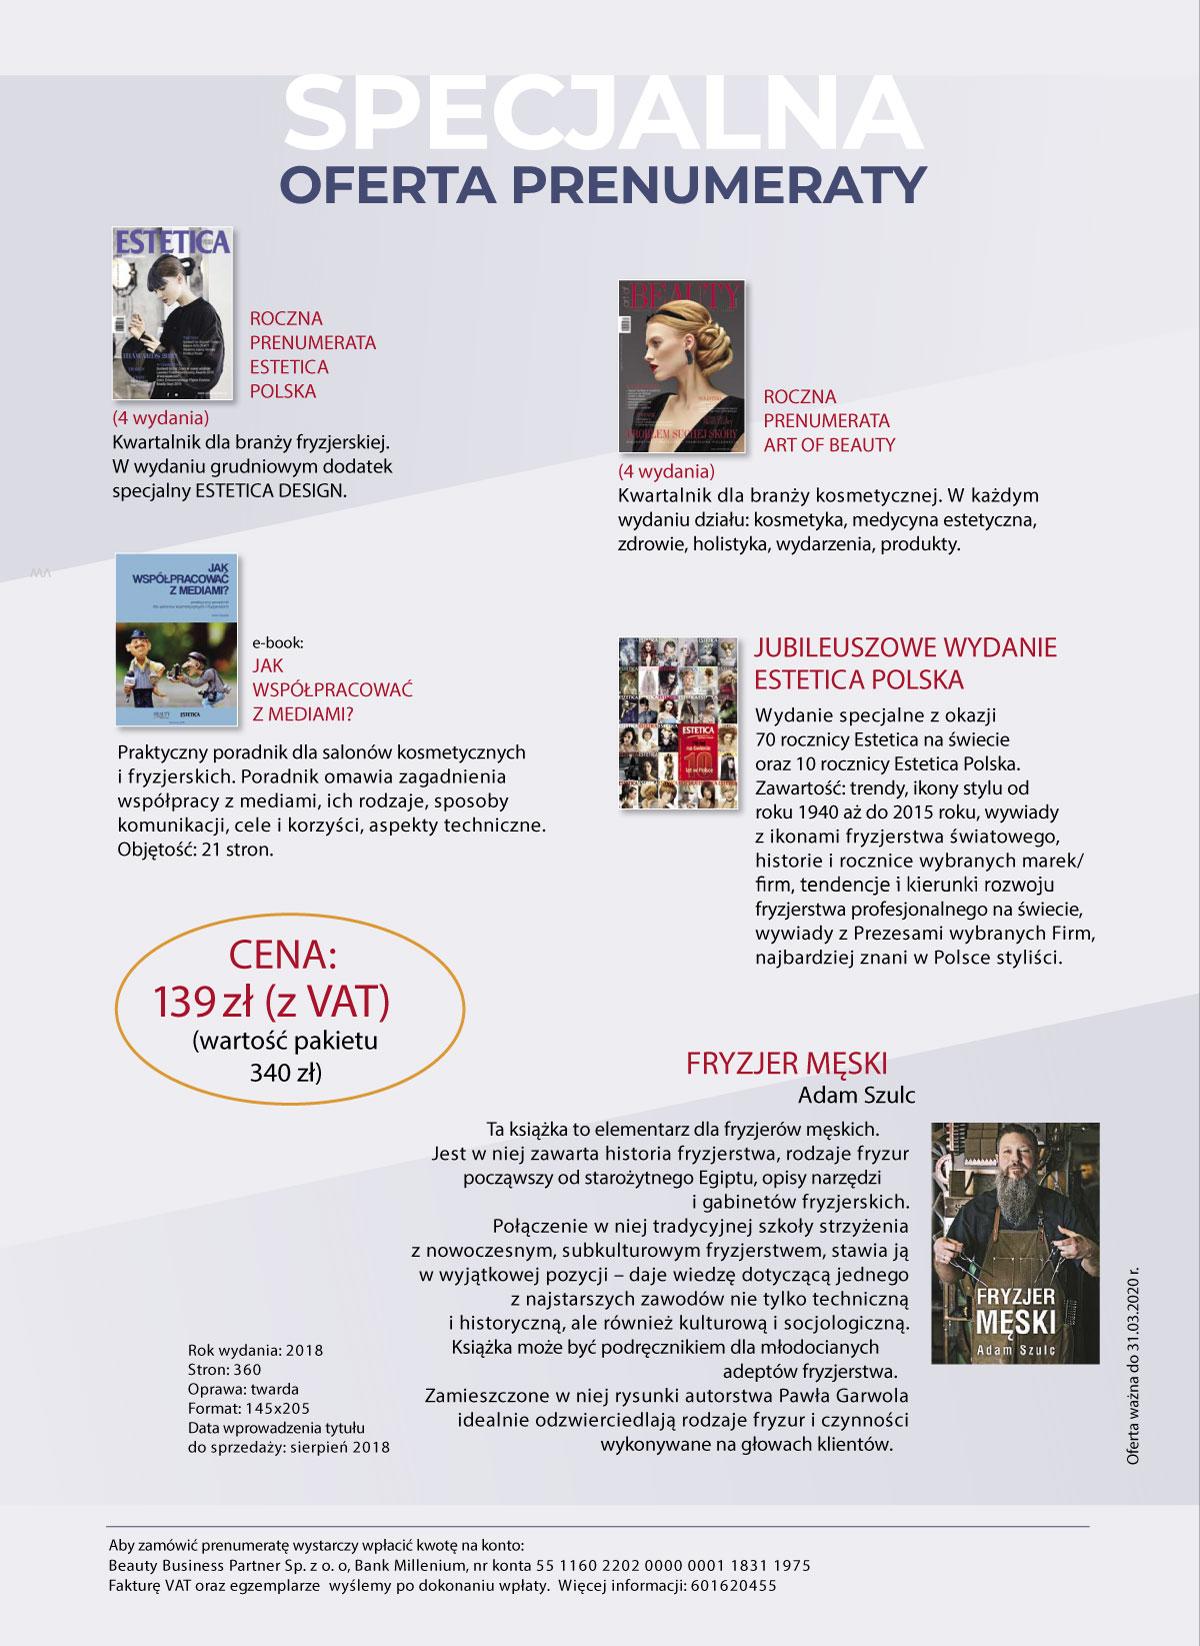 Estetica Polska Specjalna oferta prenumeraty